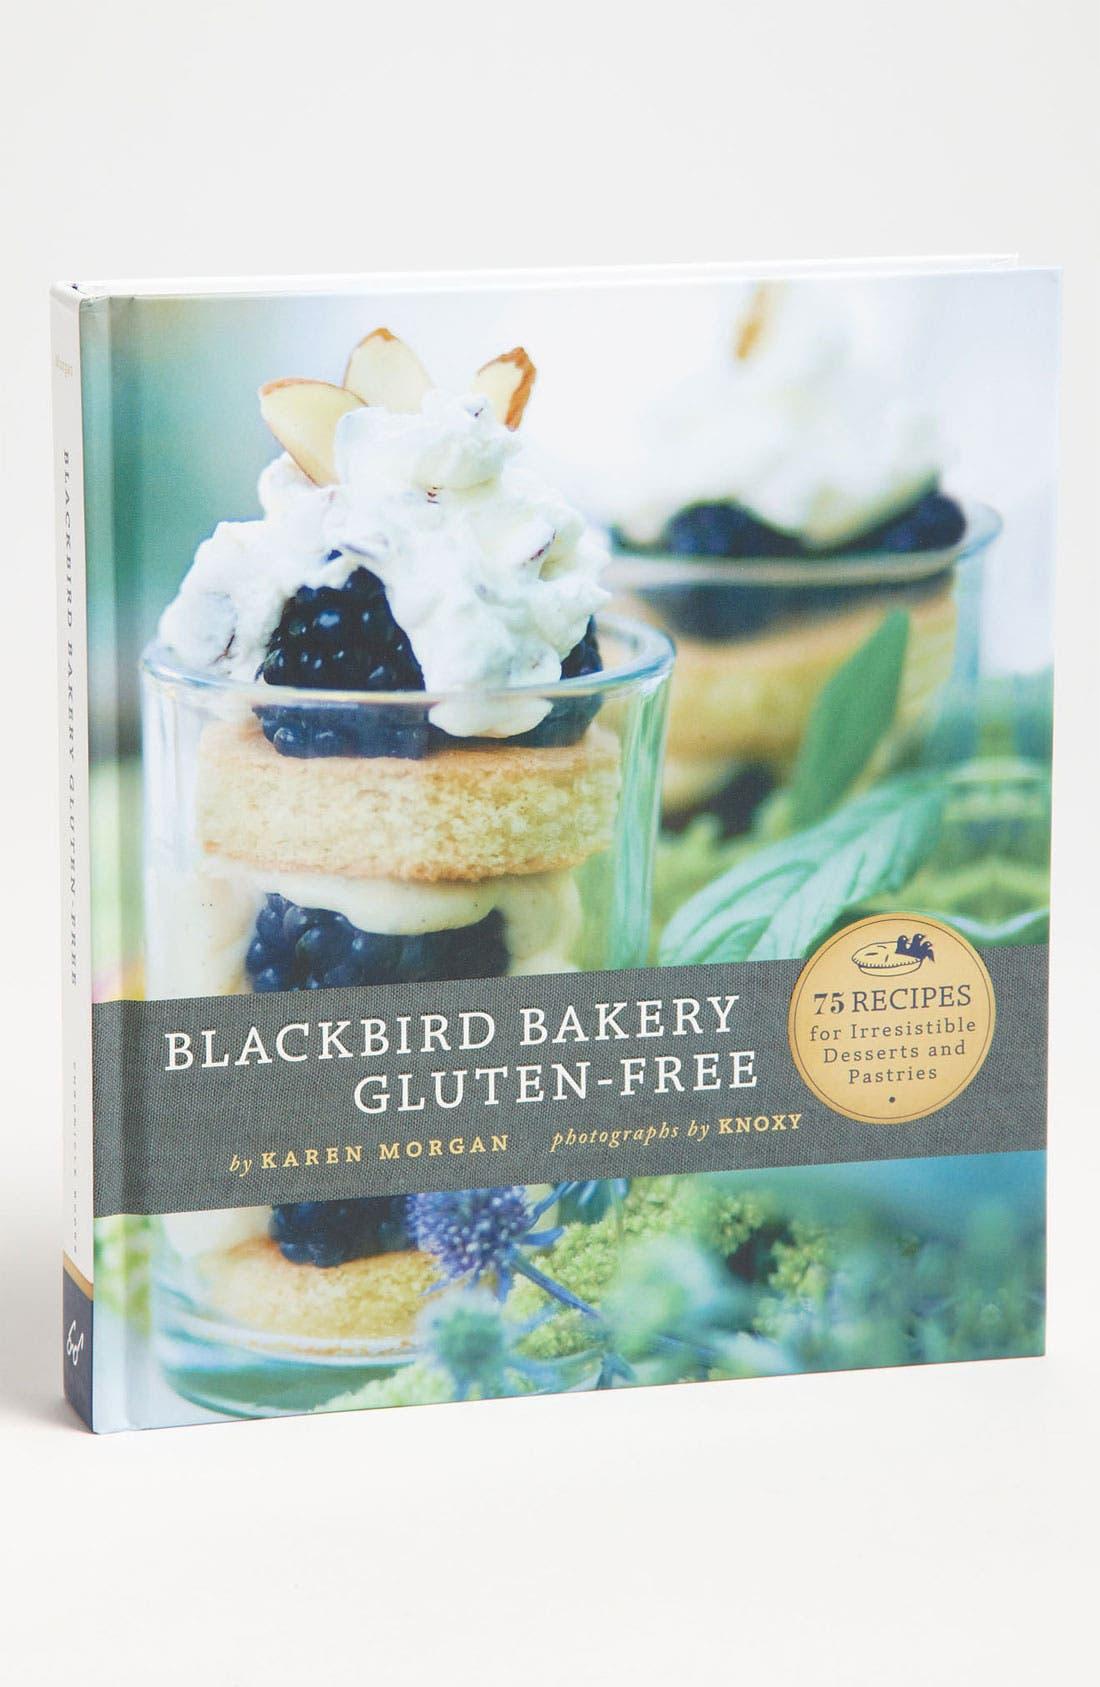 Alternate Image 1 Selected - 'Blackbird Bakery Gluten-Free' Cookbook